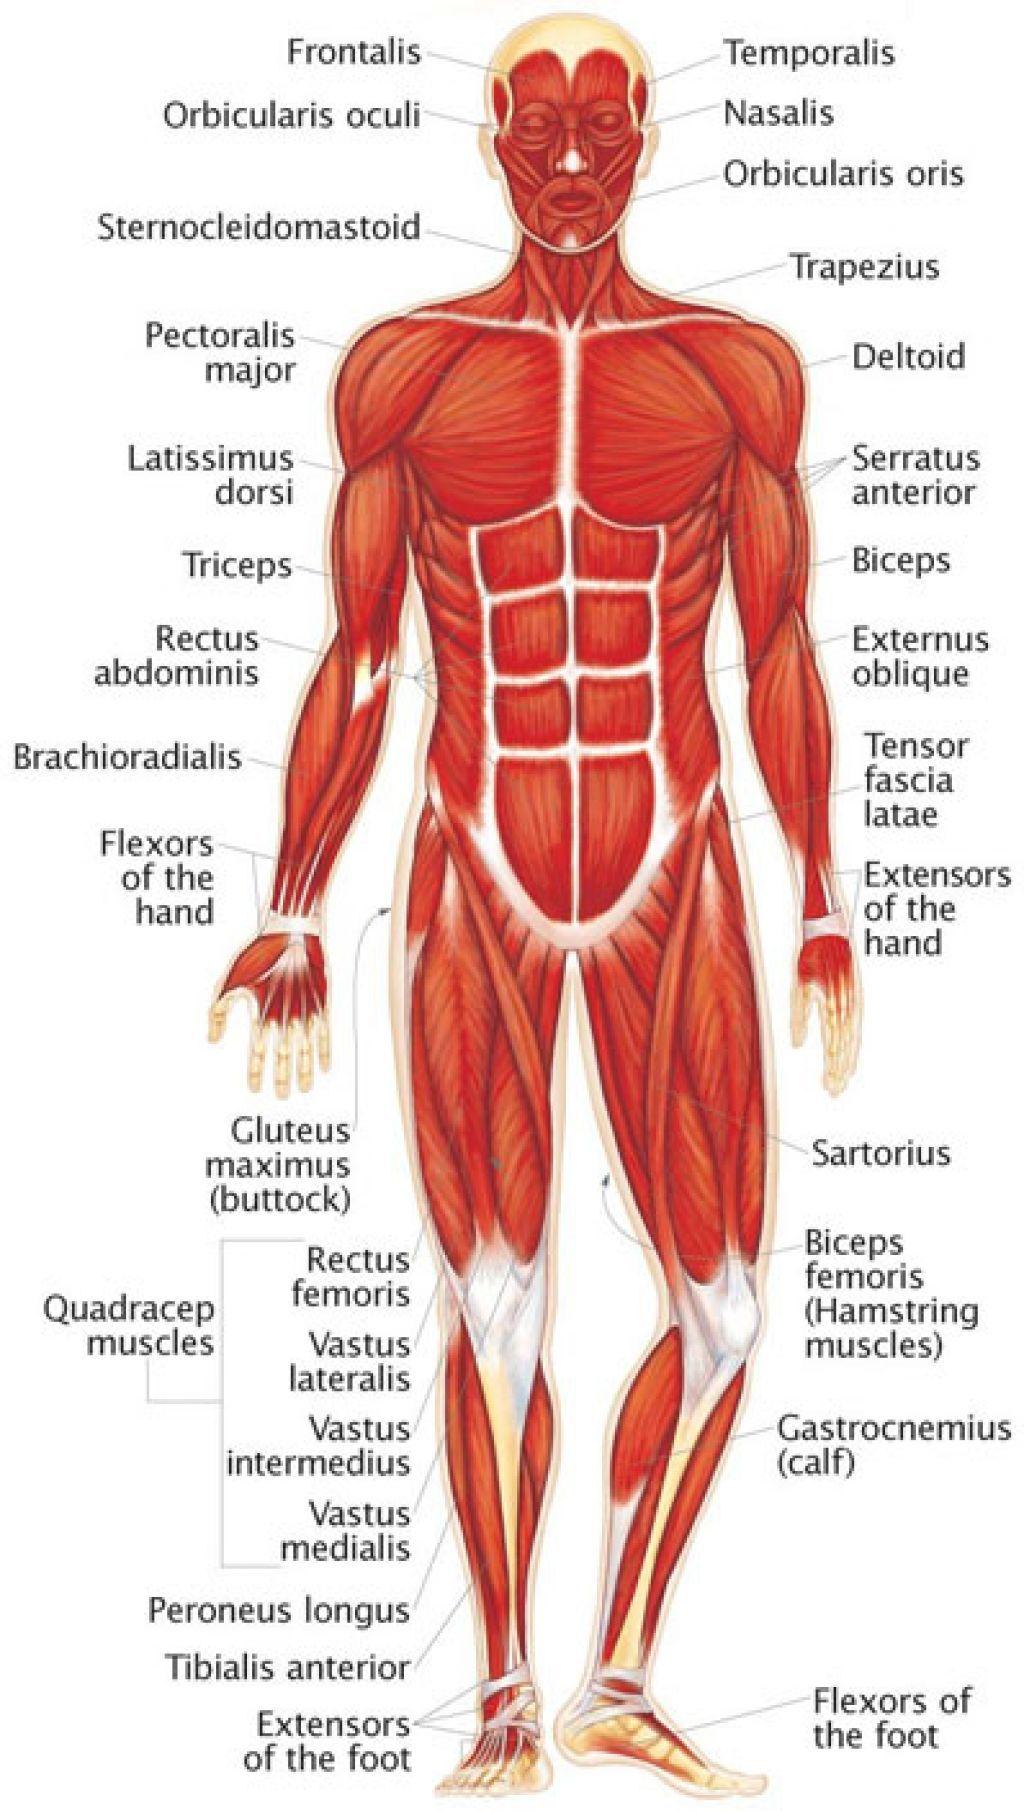 Imagen relacionada | 3stud10 | Pinterest | Anatomy, Med school and ...